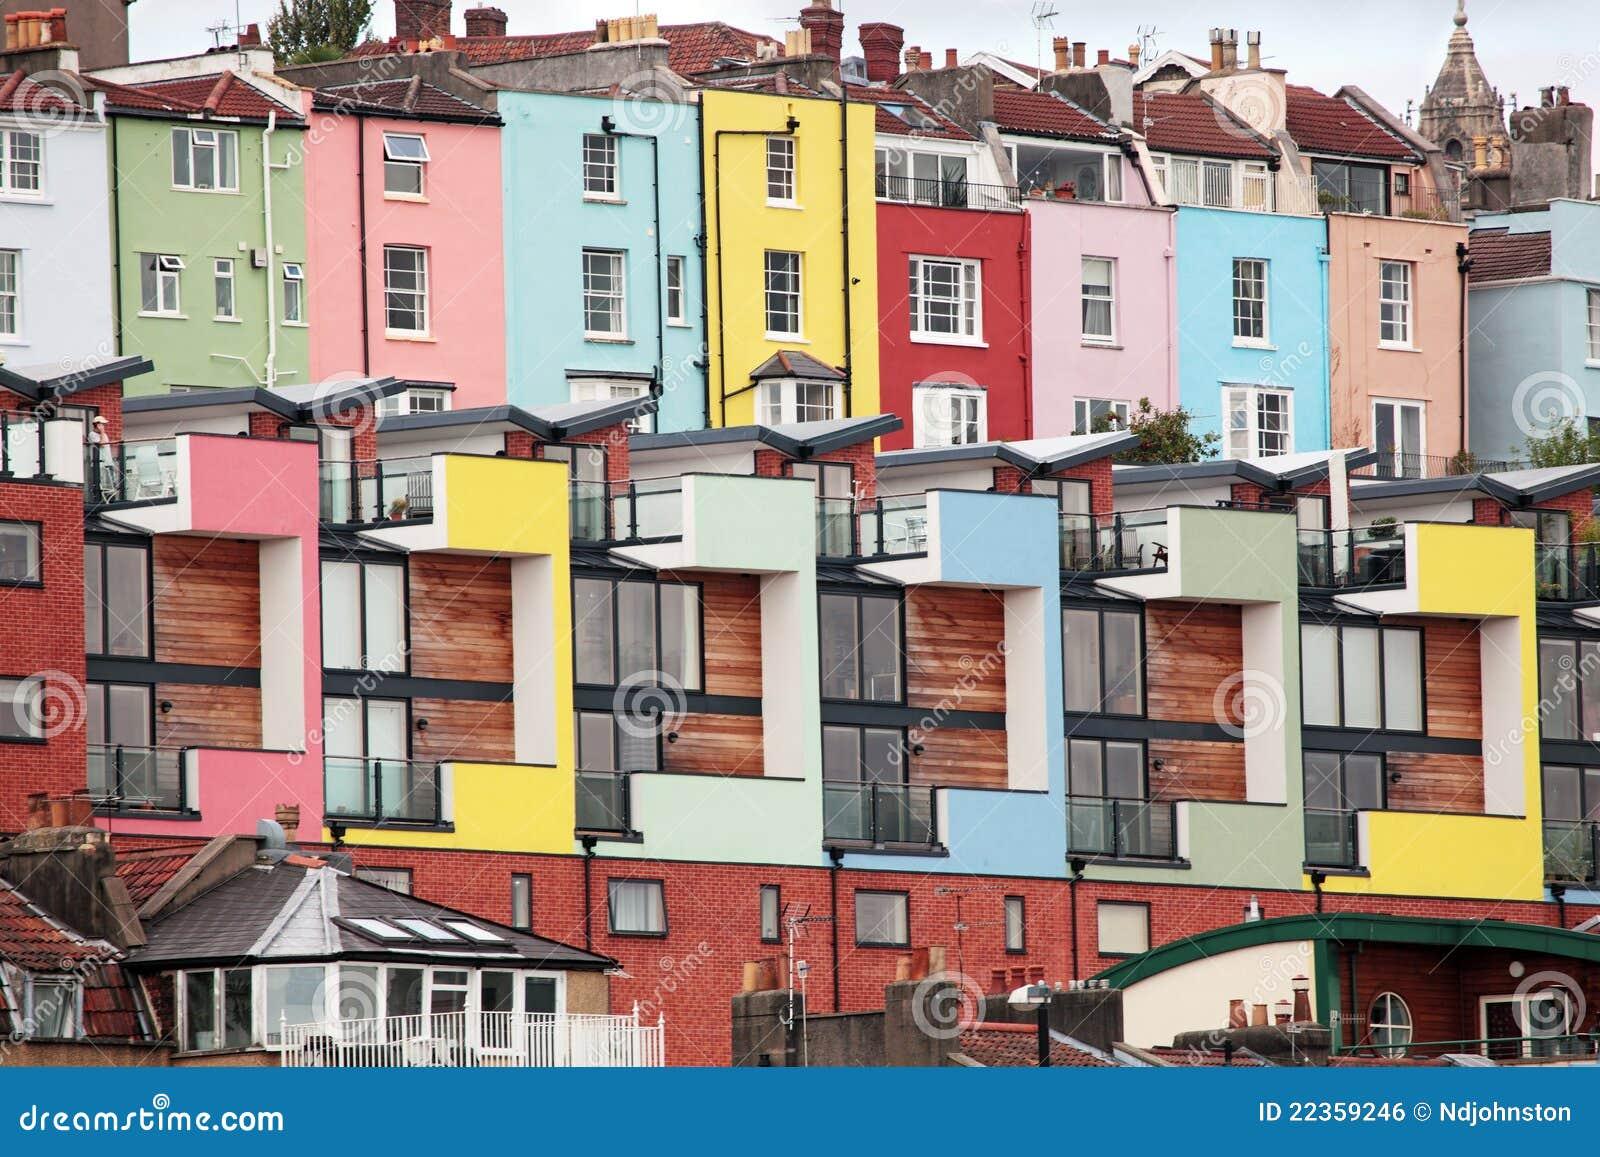 Colourful houses, Bristol, England